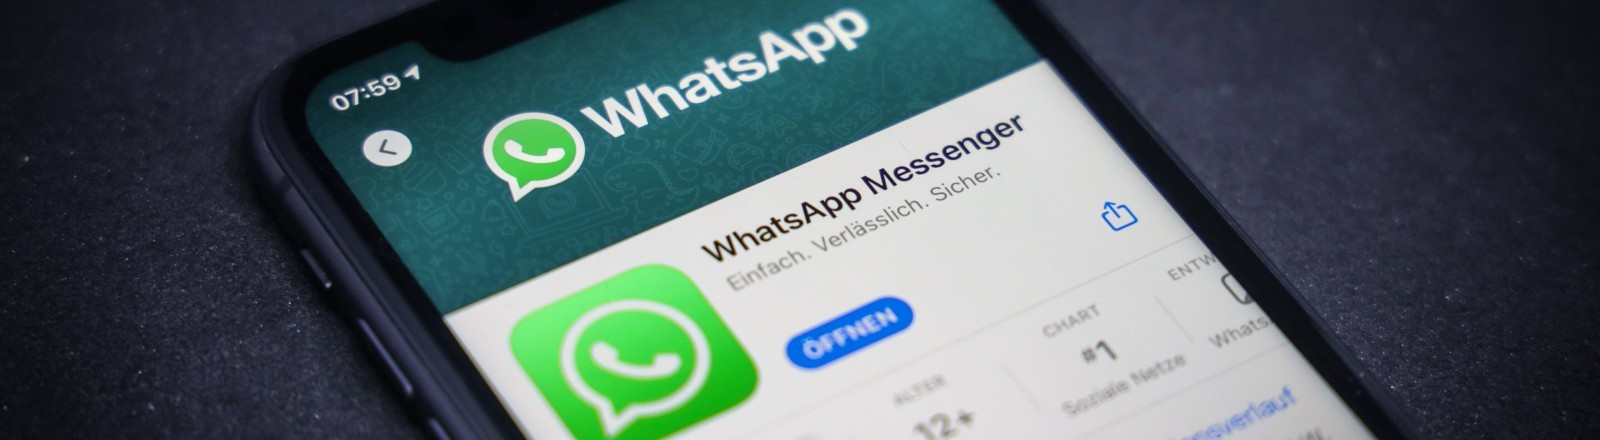 WhatsApp-Messenger im Appstore